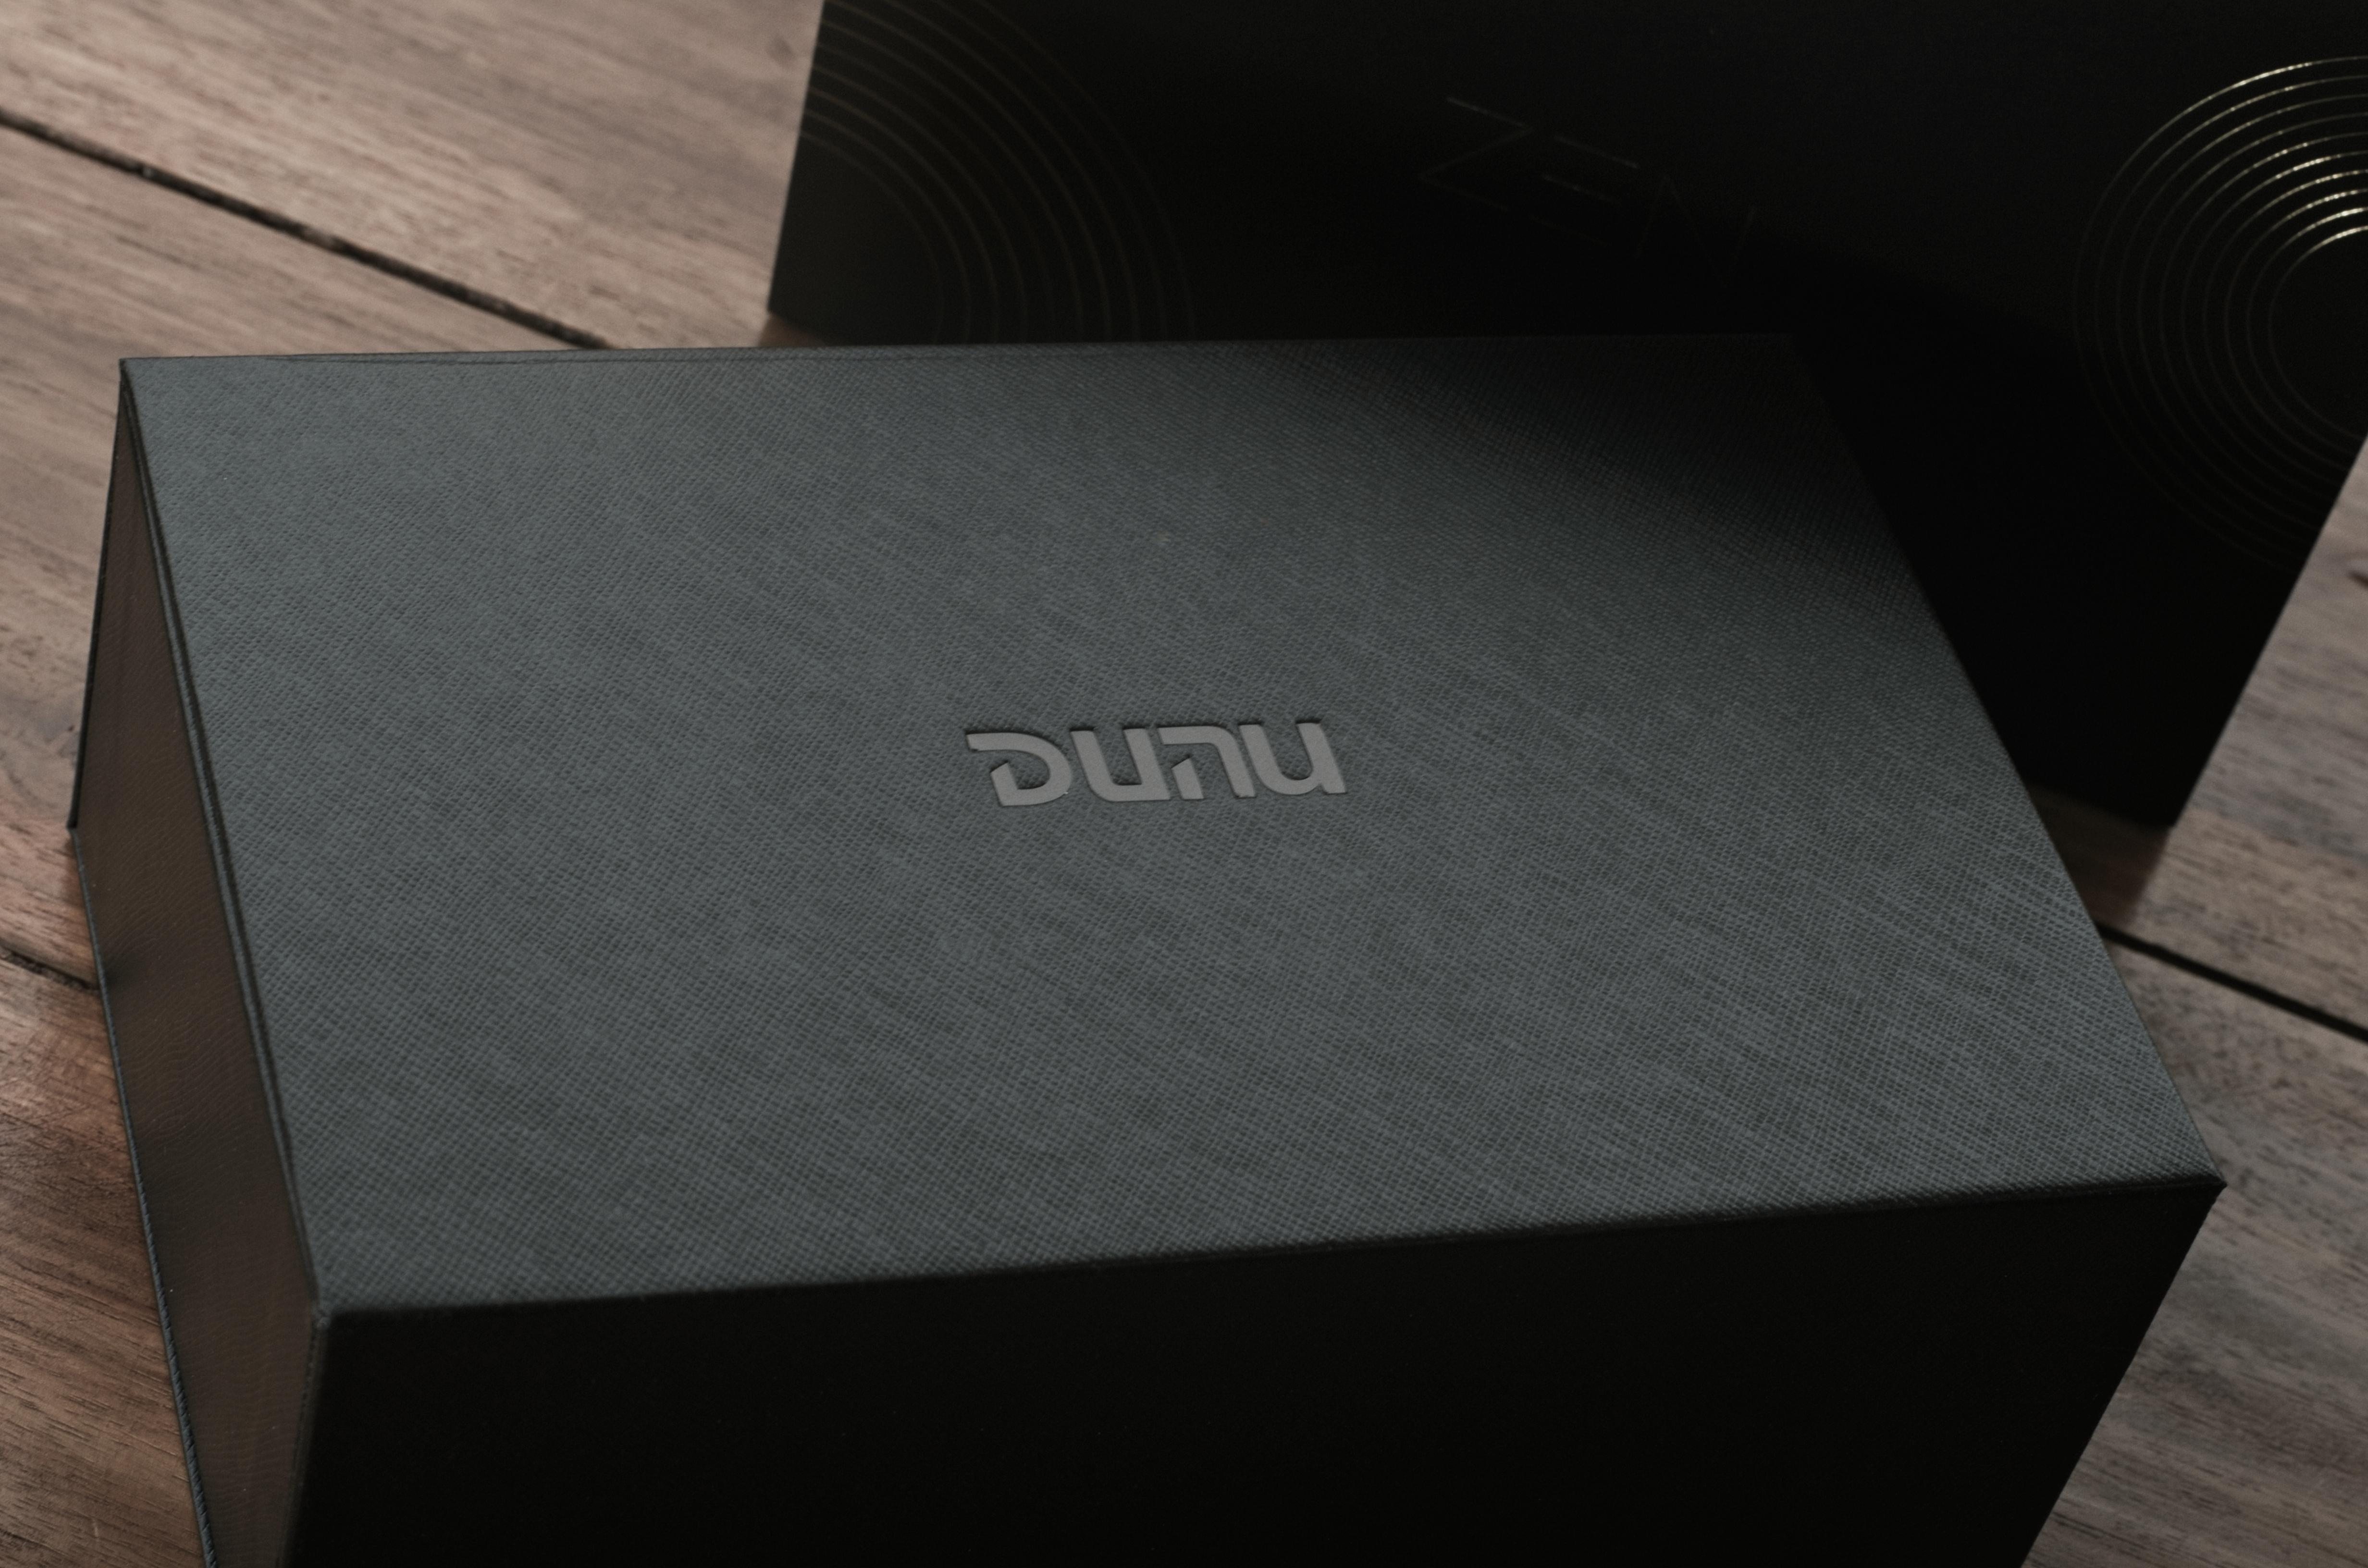 DUNU 2ghghd.jpg